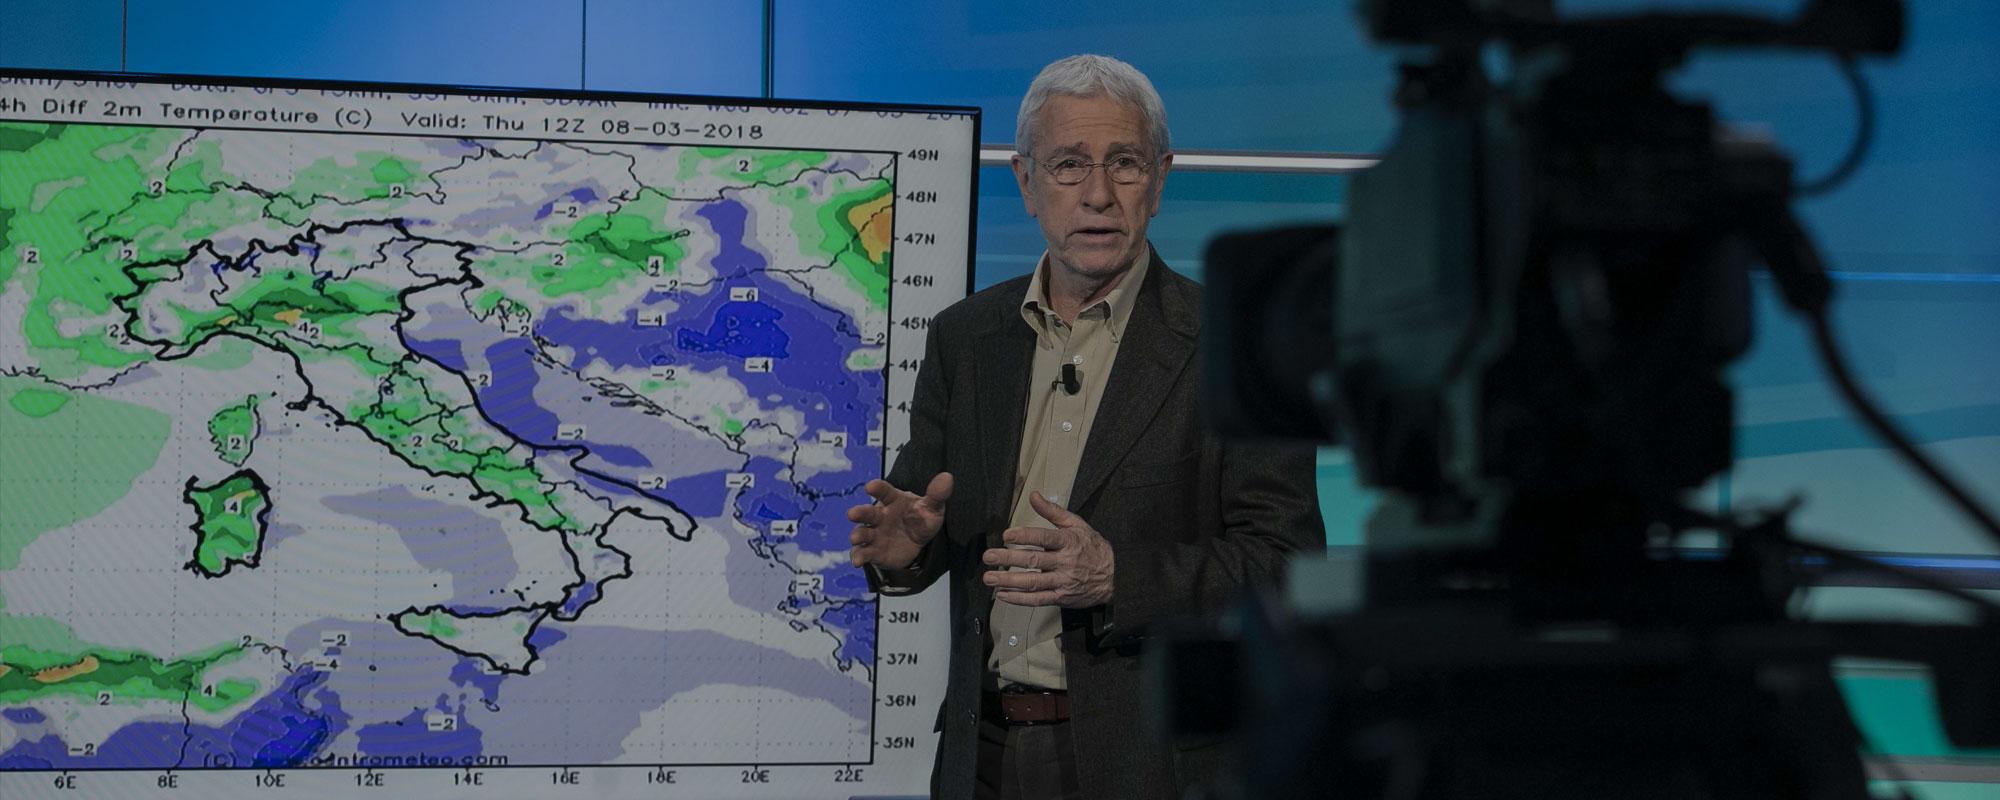 Paolo Sottocorona